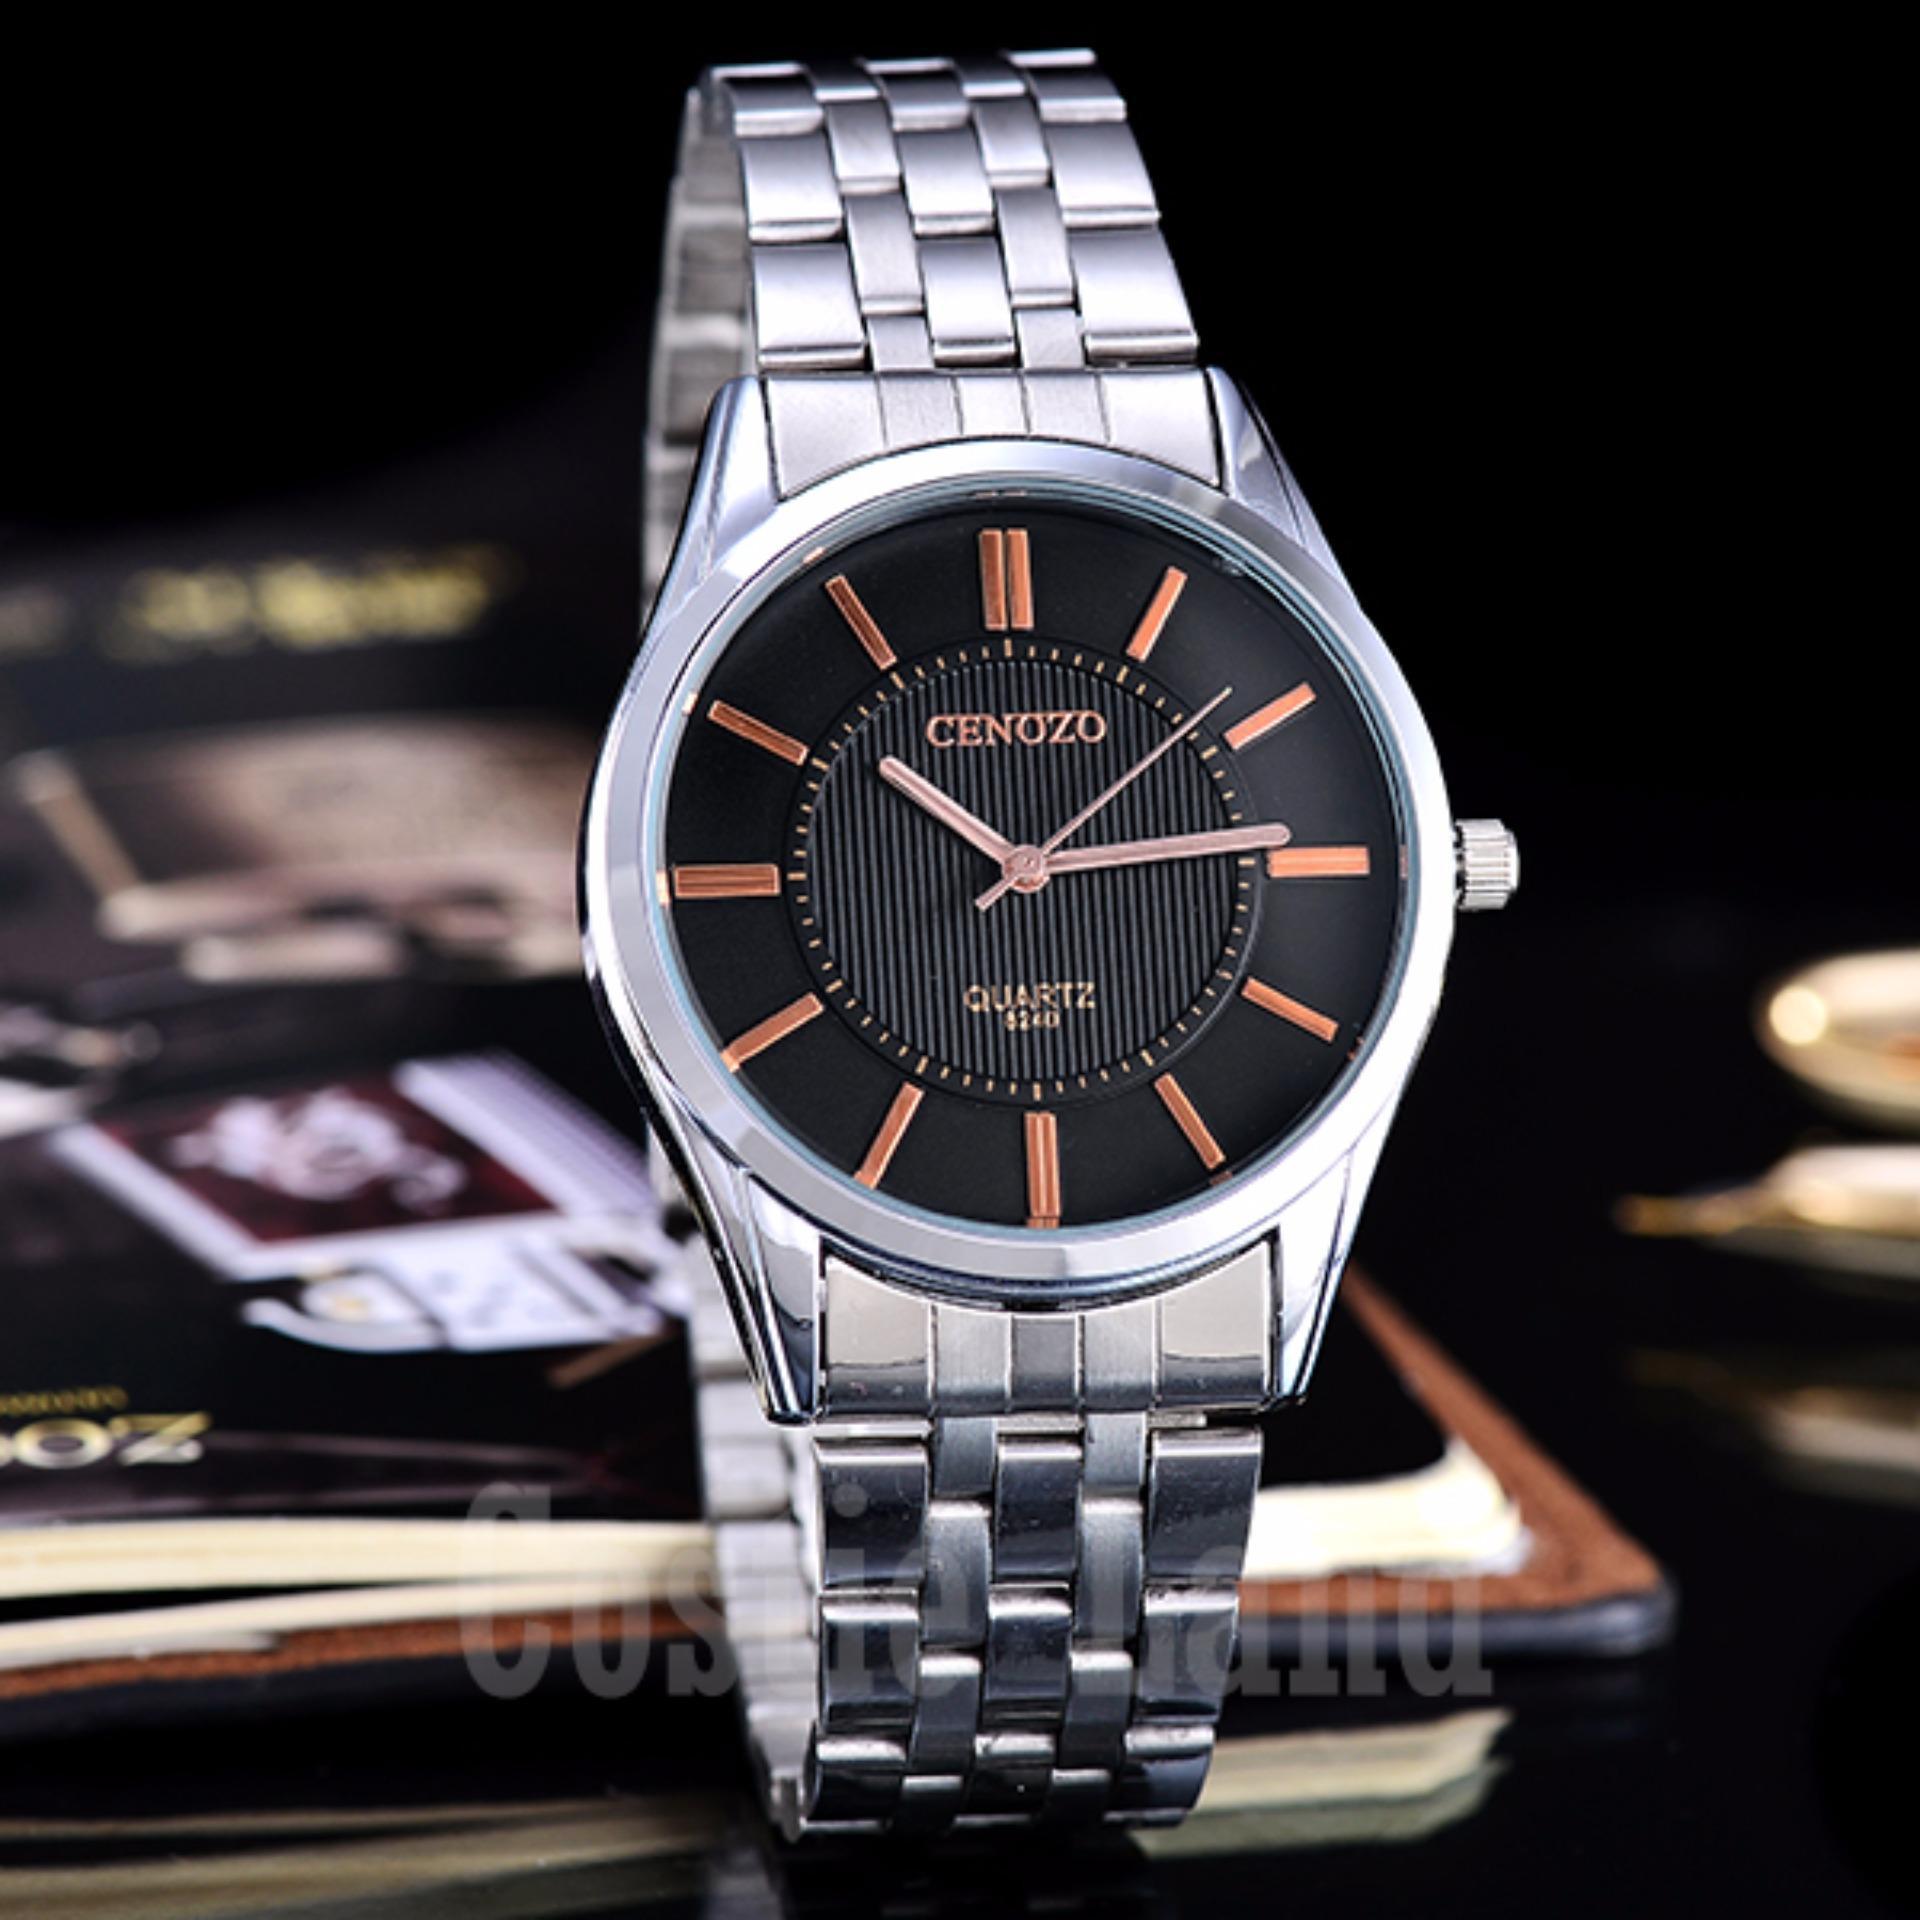 Hot Deals Cenozo - Jam Tangan Pria - Body Silver - Black/RoseGold Dial -